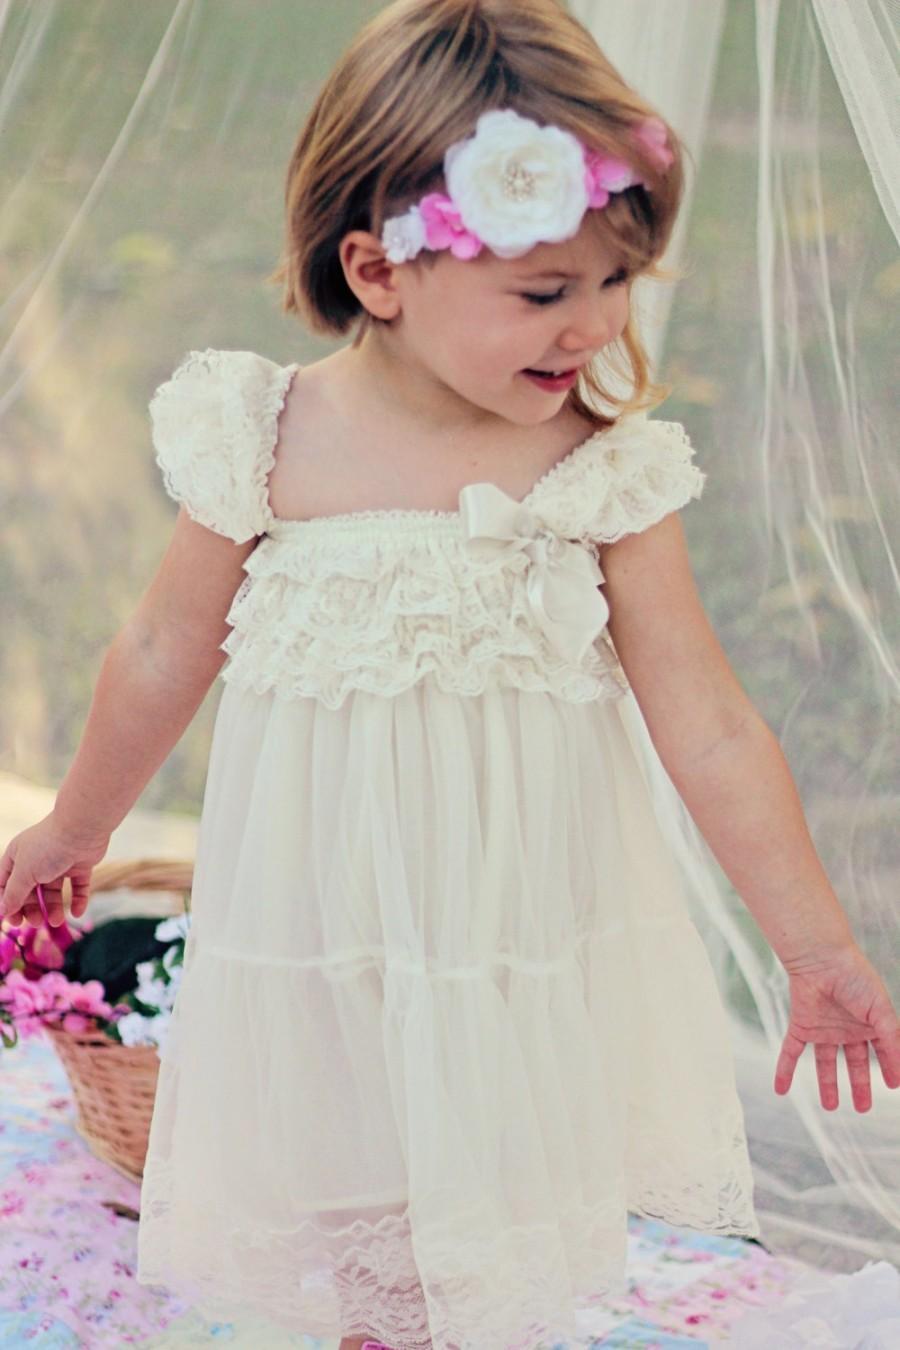 Mariage - Flower Girl Dress-Baptism Dress-Ivory Lace Dress-Baby girl Clothes-Newborn Girl Dress-Tutu Dress-Baby Dress-Christening Dress-Wedding